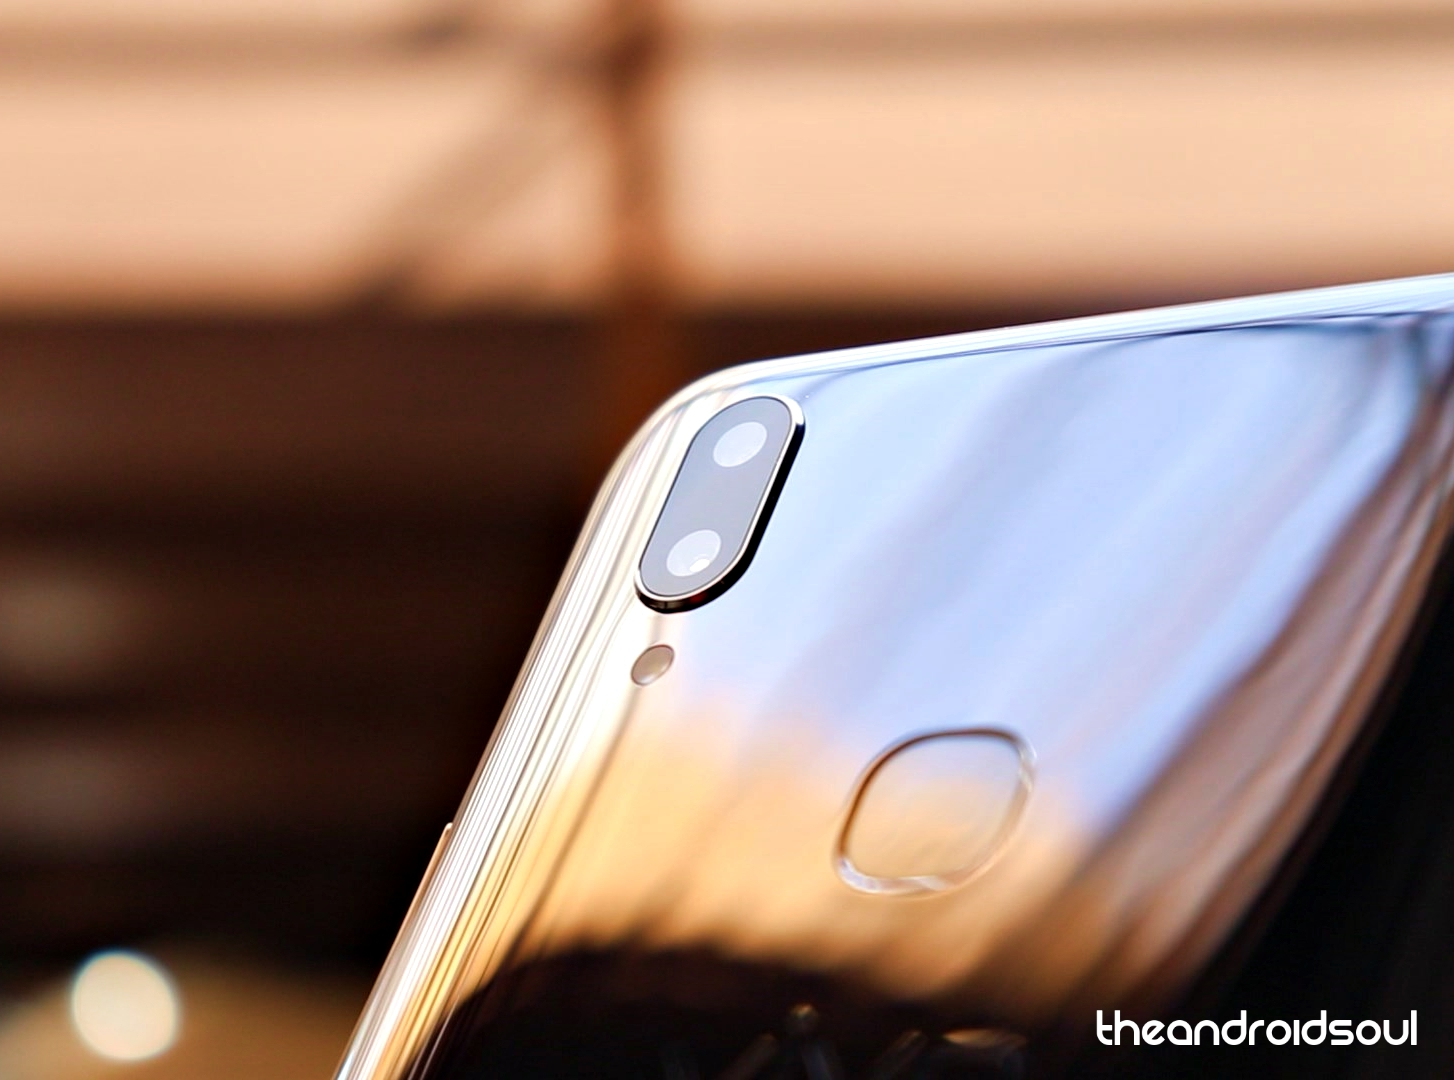 Vivo V9 vs iPhone X: Camera review and comparison